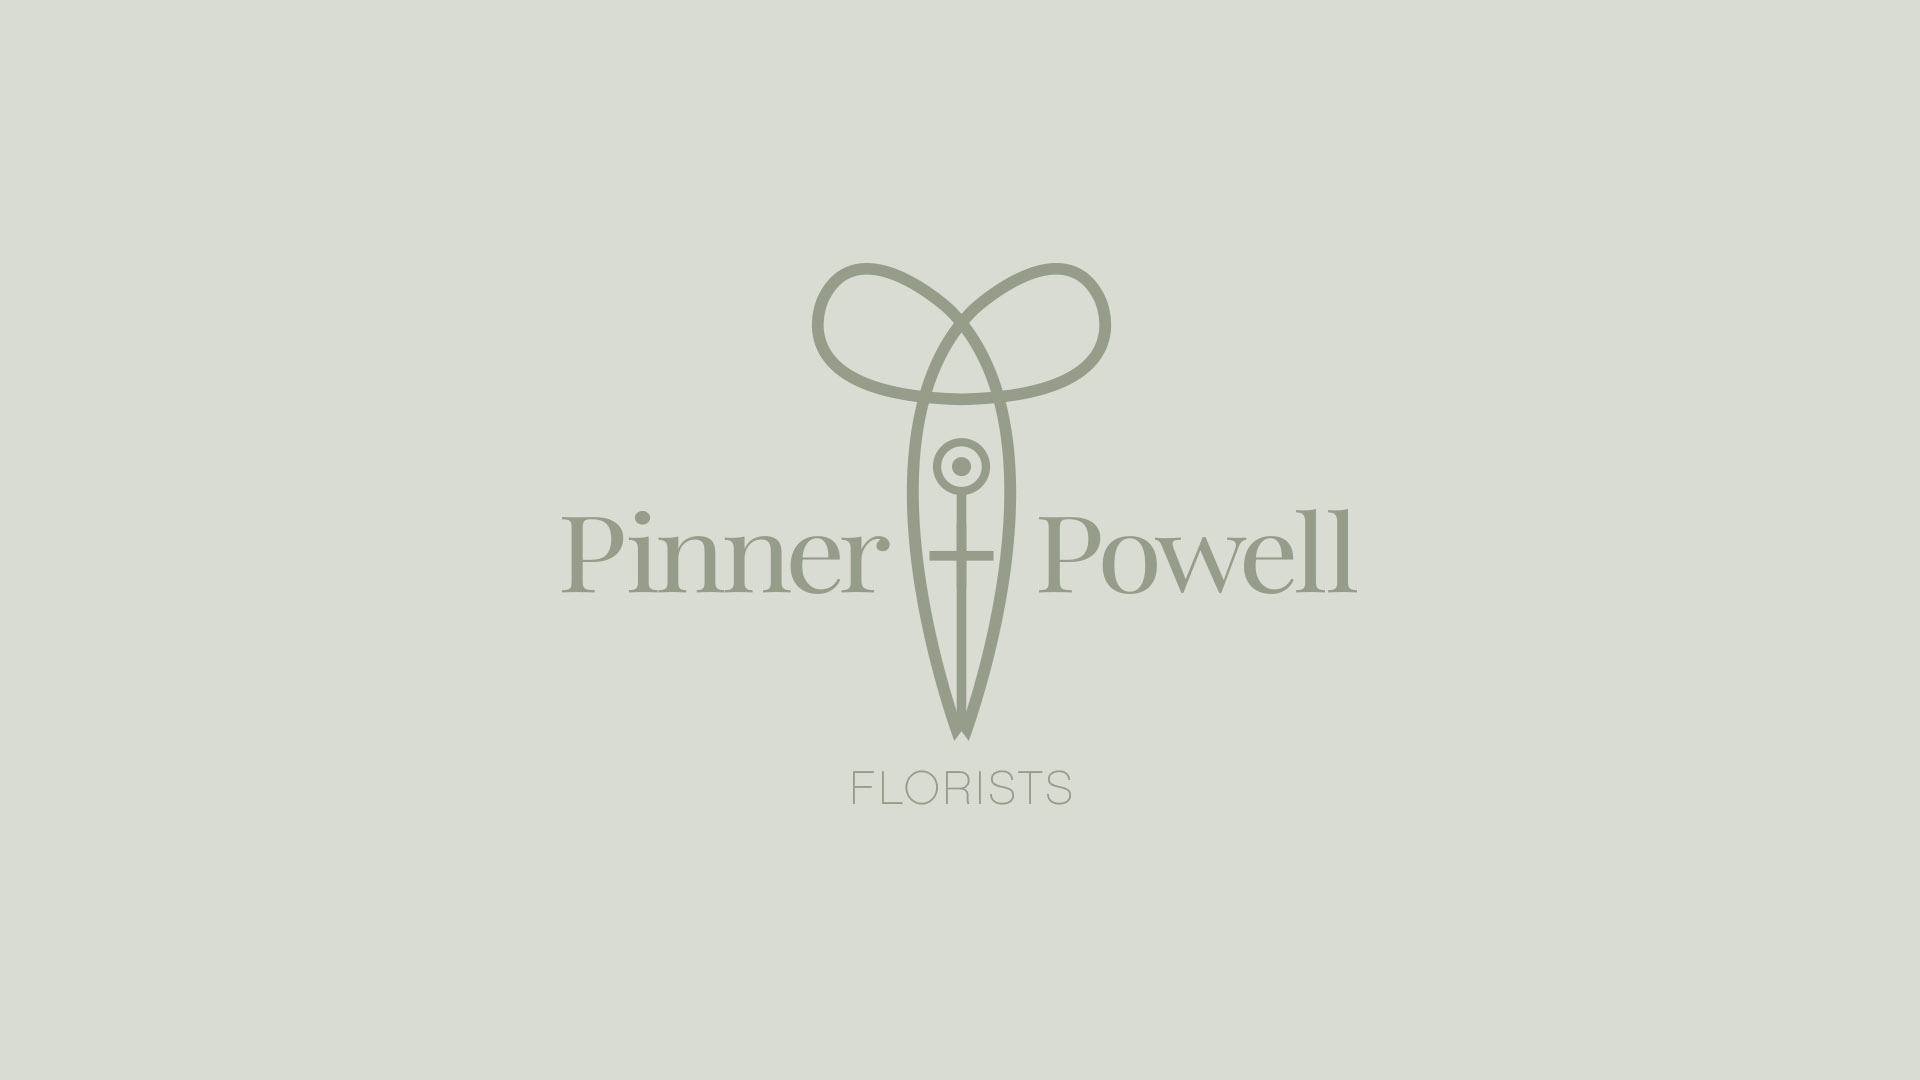 Pinner + Powell Florist logo design